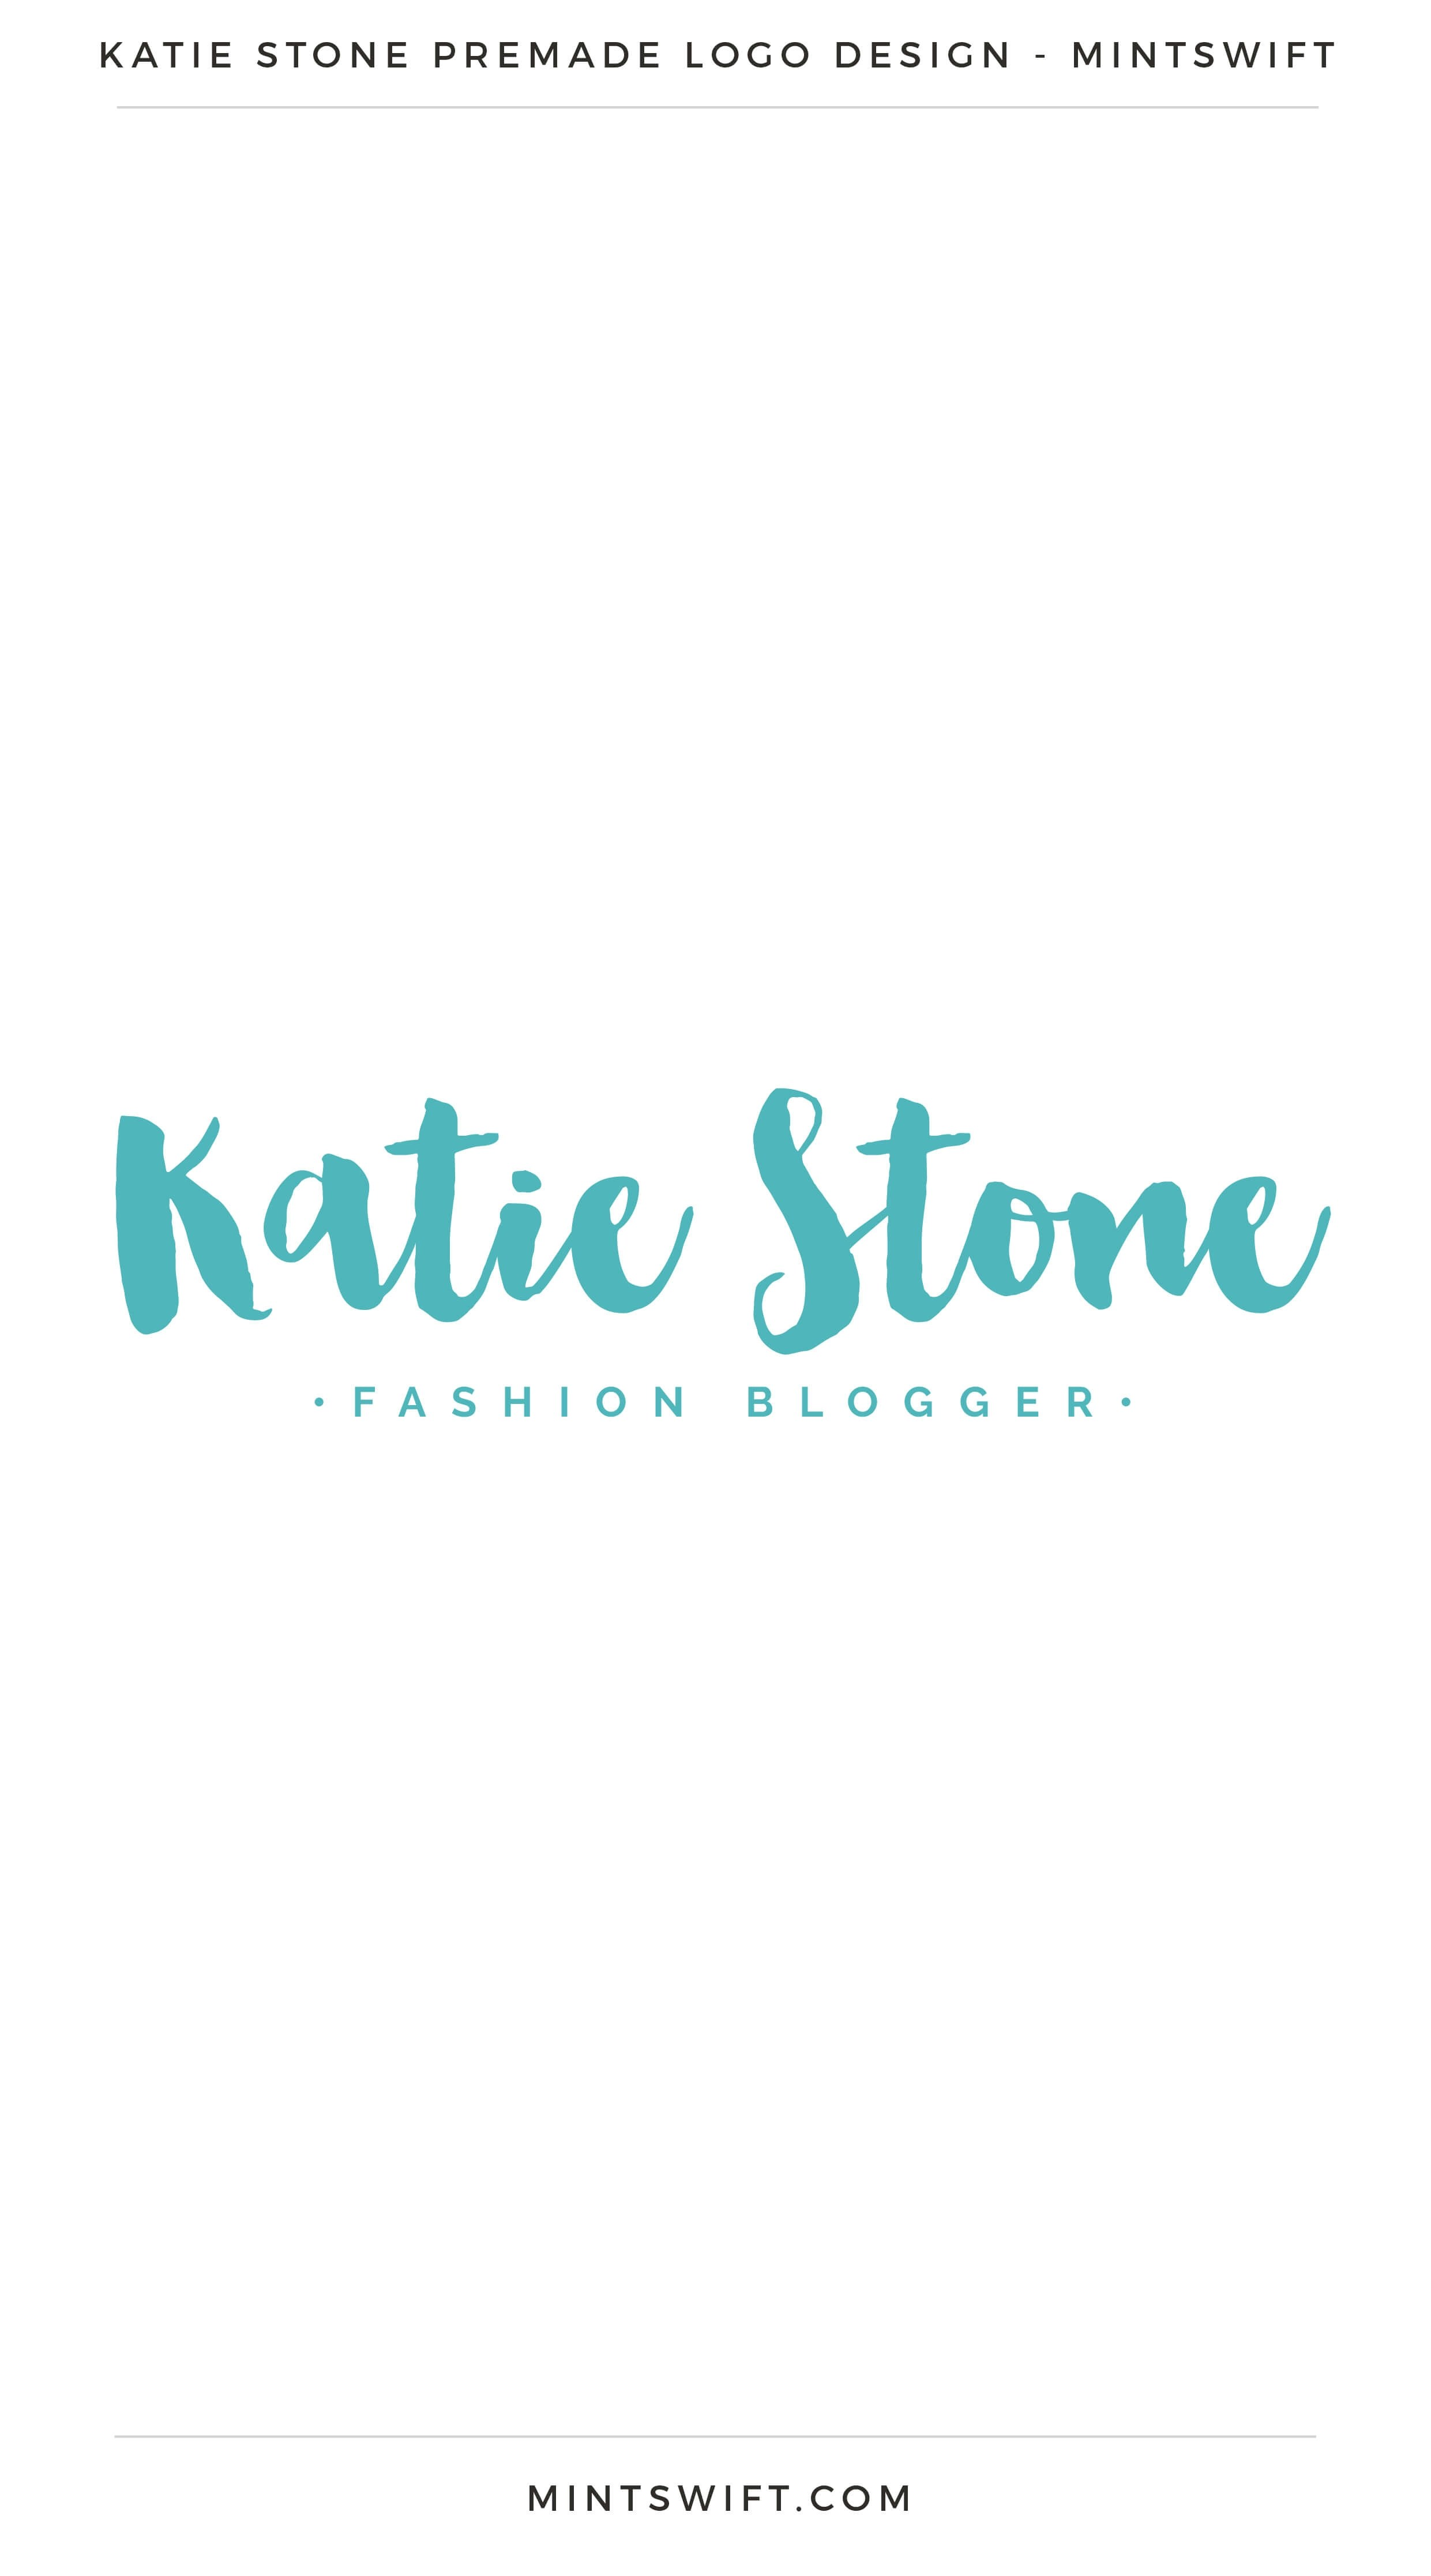 Katie Stone Premade Logo | Premade Logo | Premade logos | Pre-made logo | Premade Brand Design| Branding | Brand Design | Logo Shop | Branding kits shop | MintSwift Shop | Premade logo design | Add-On | Logo Design | MintSwift| Adrianna Glowacka | MintSwift Design